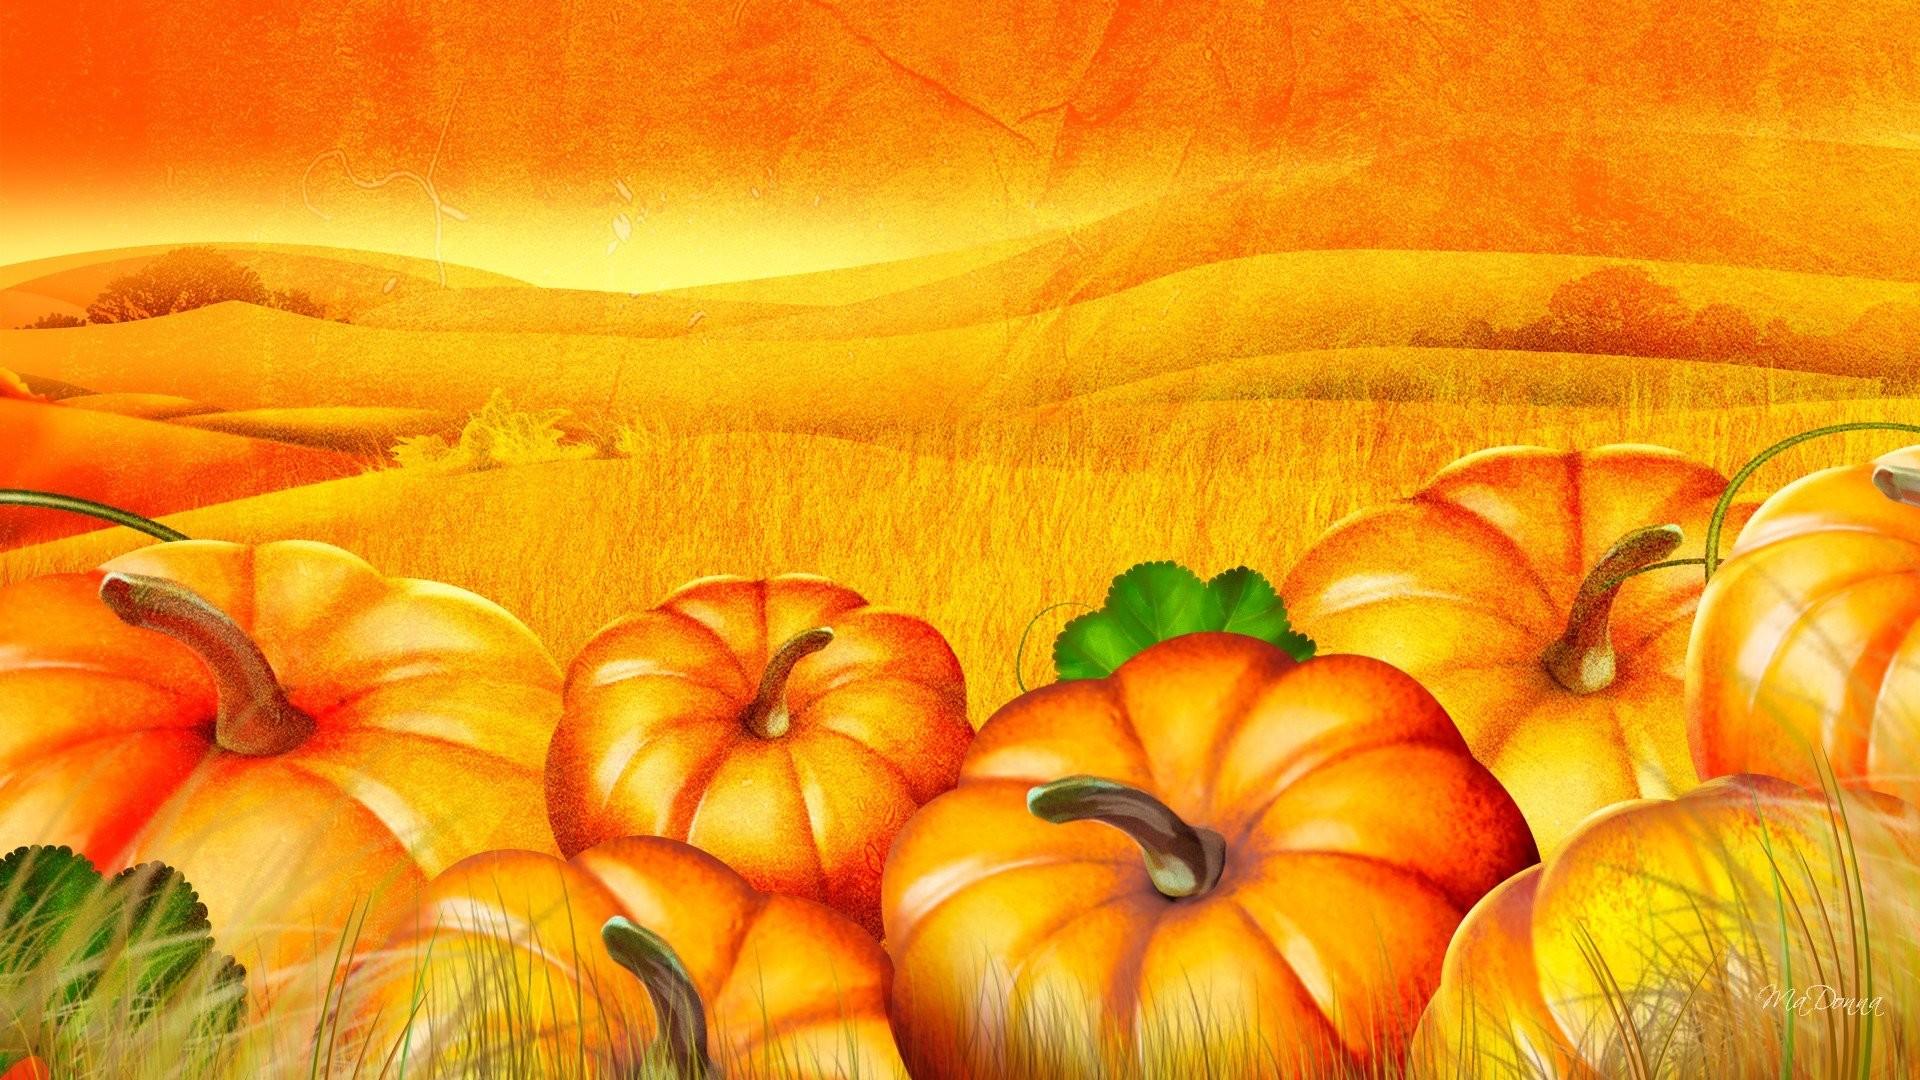 Fall Pumpkins 4K HD Desktop Wallpaper for 4K Ultra HD TV